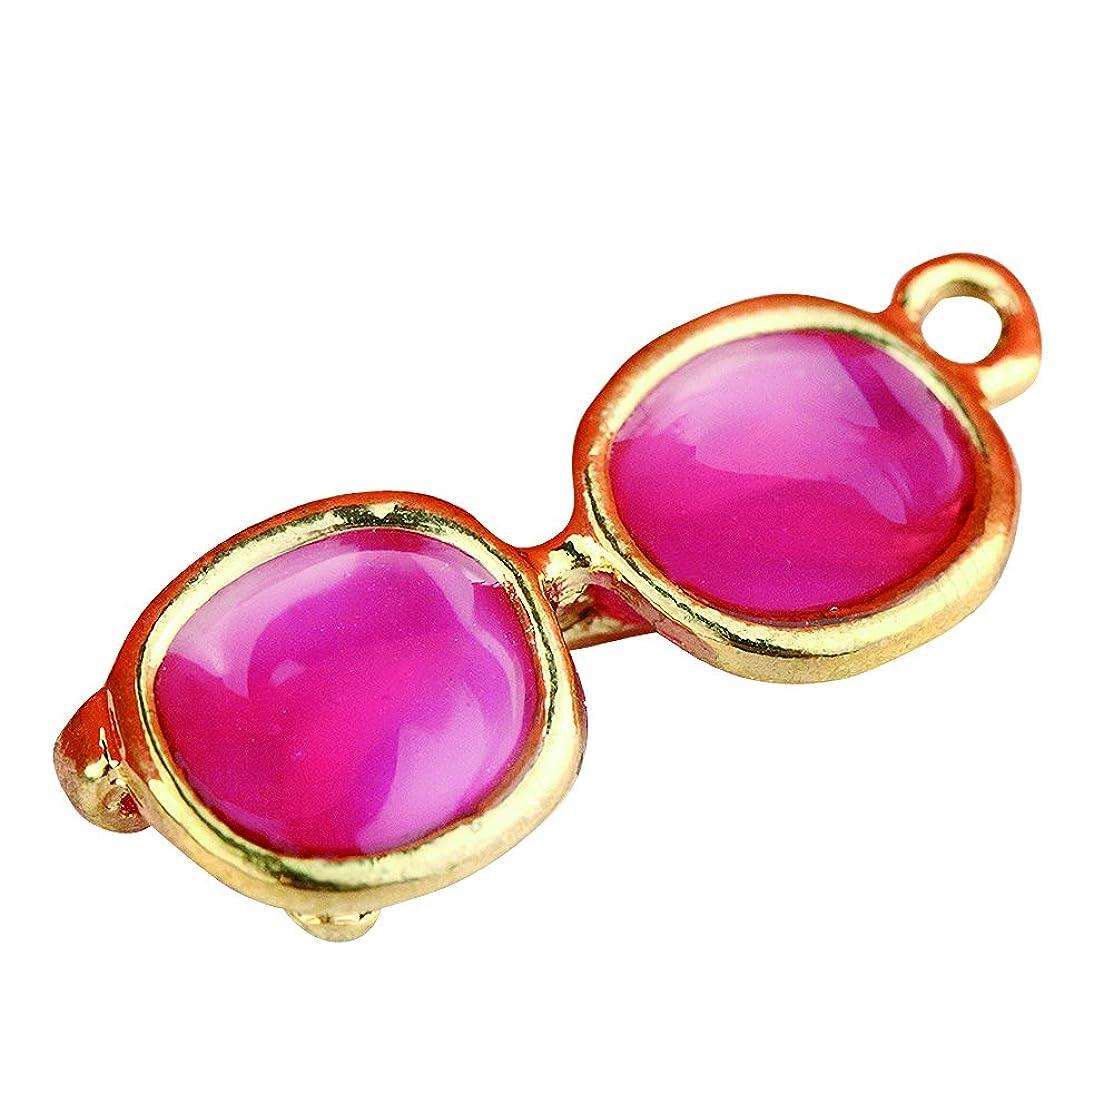 Creative DIY Small Sunglasses Charms Pendants Wholesale (Set of 3) MH359